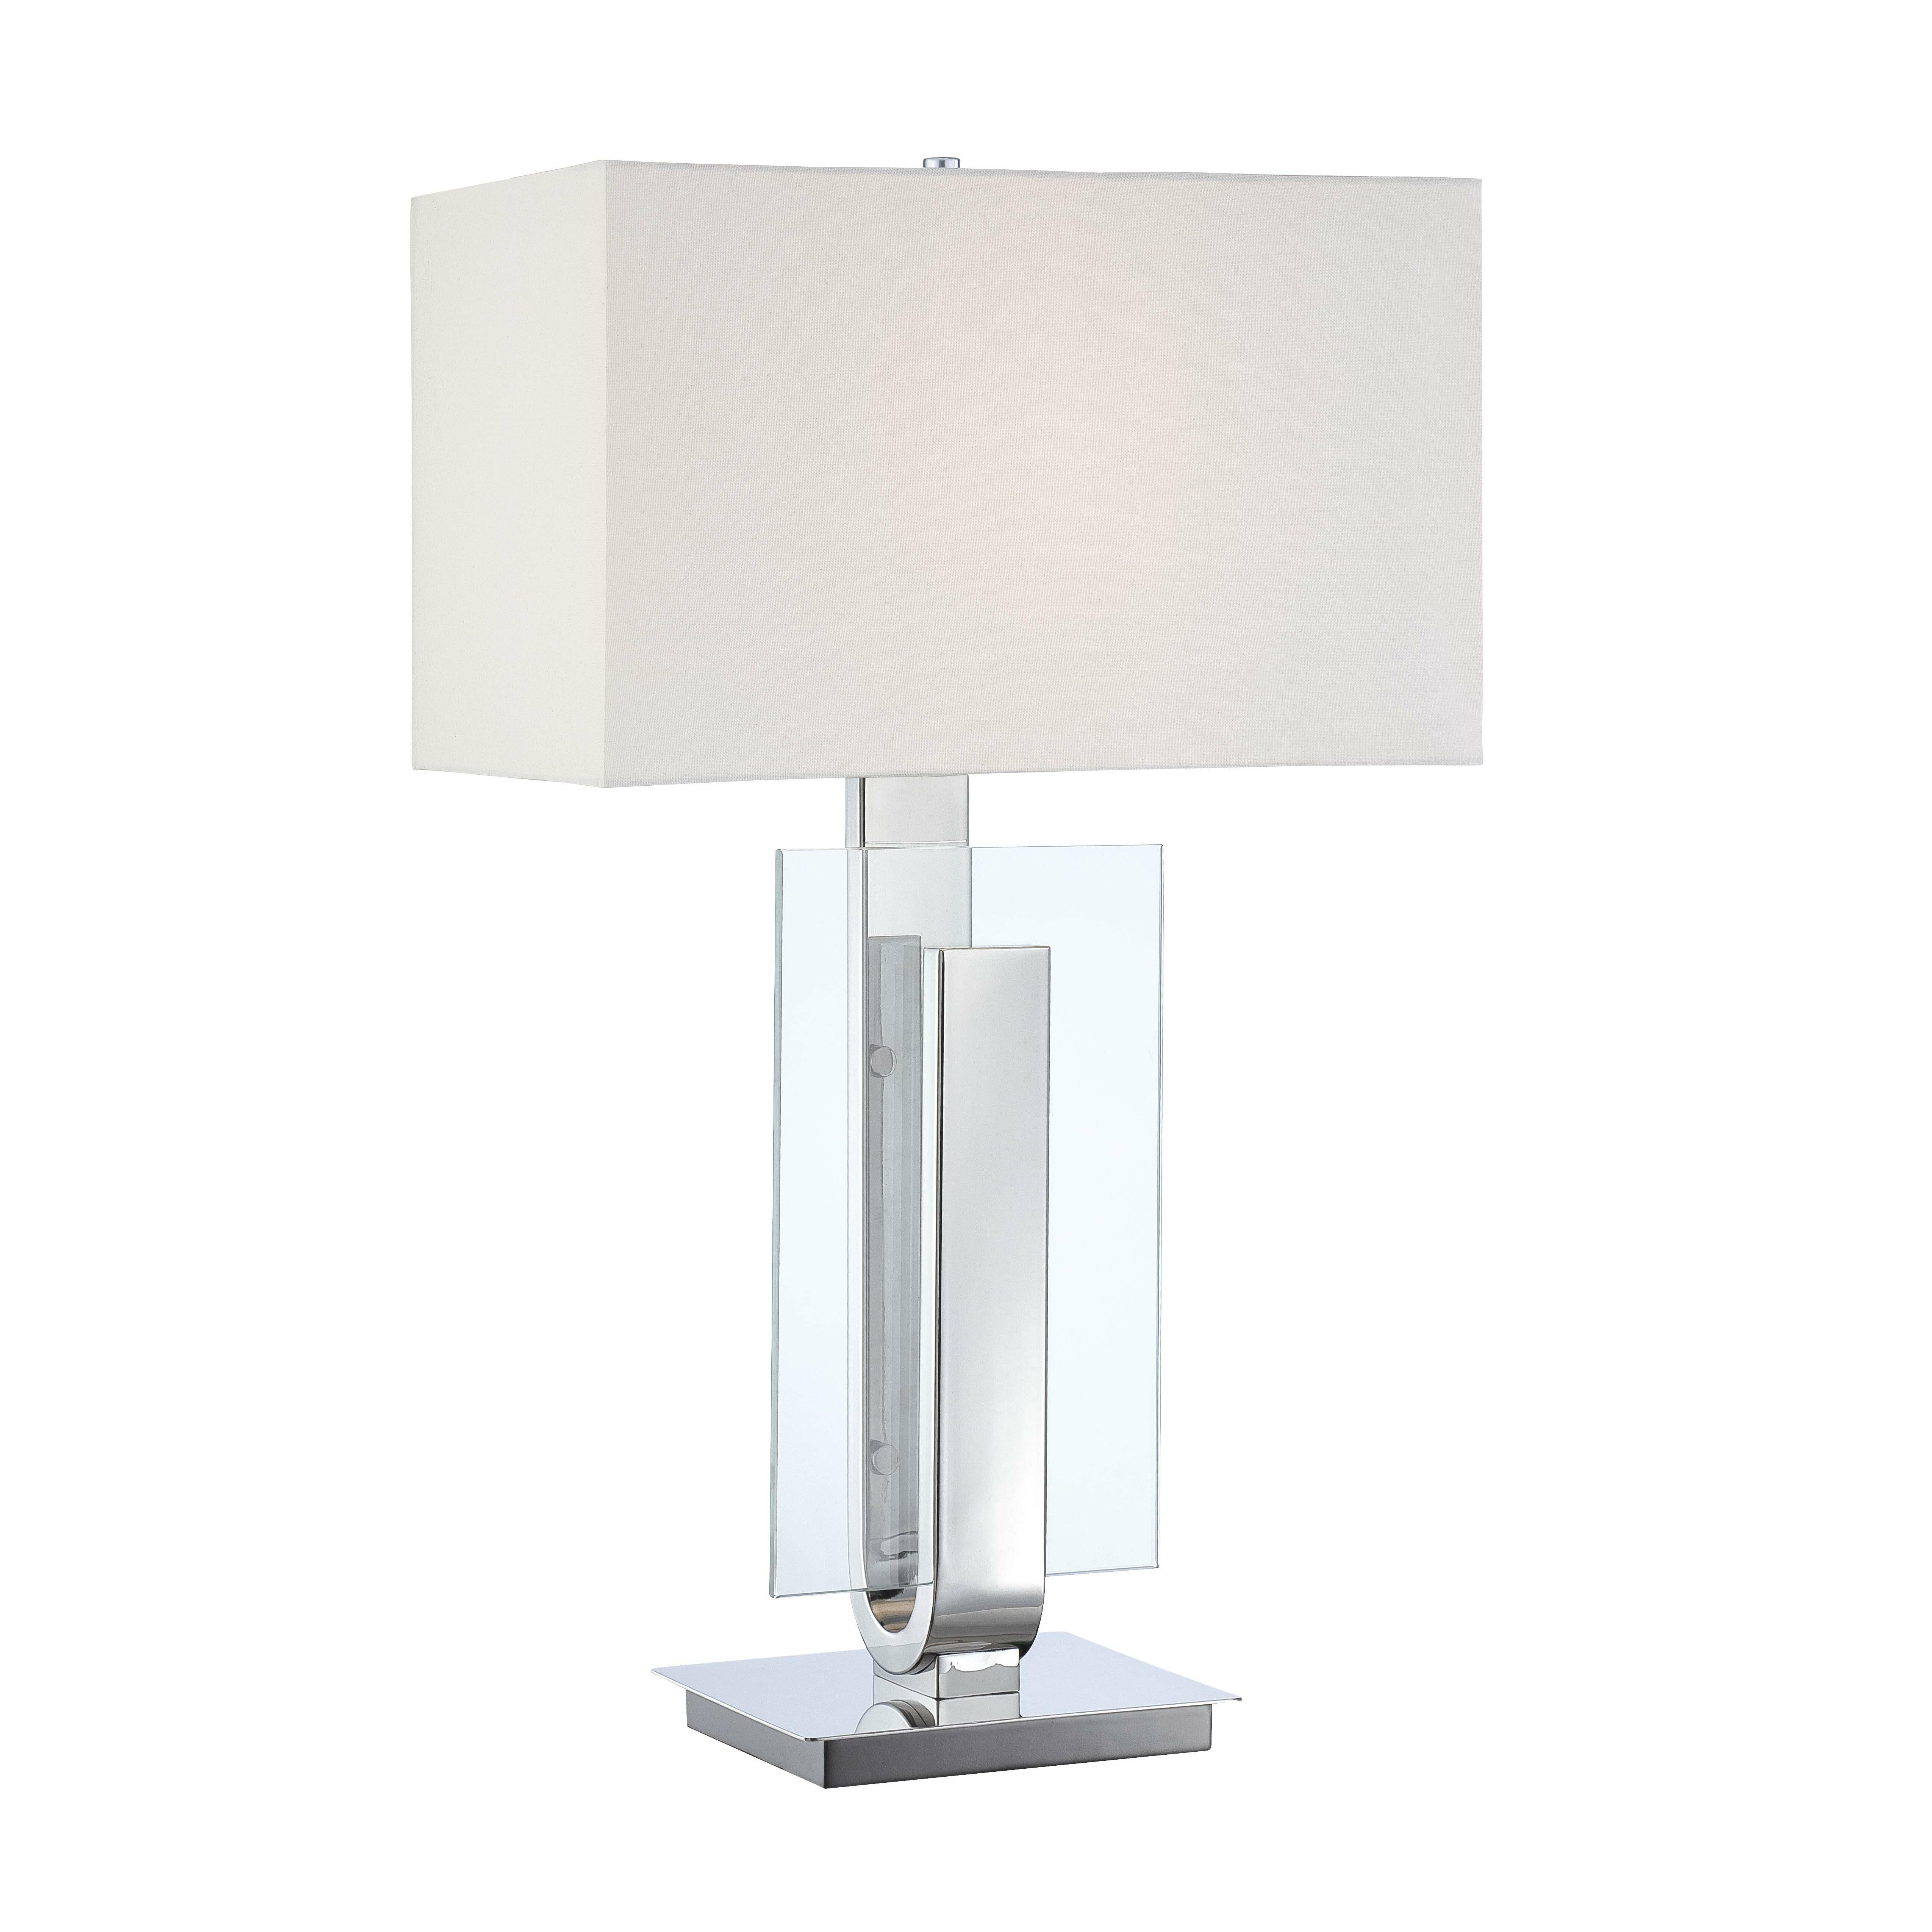 george kovacs by minka portables 31 table lamp